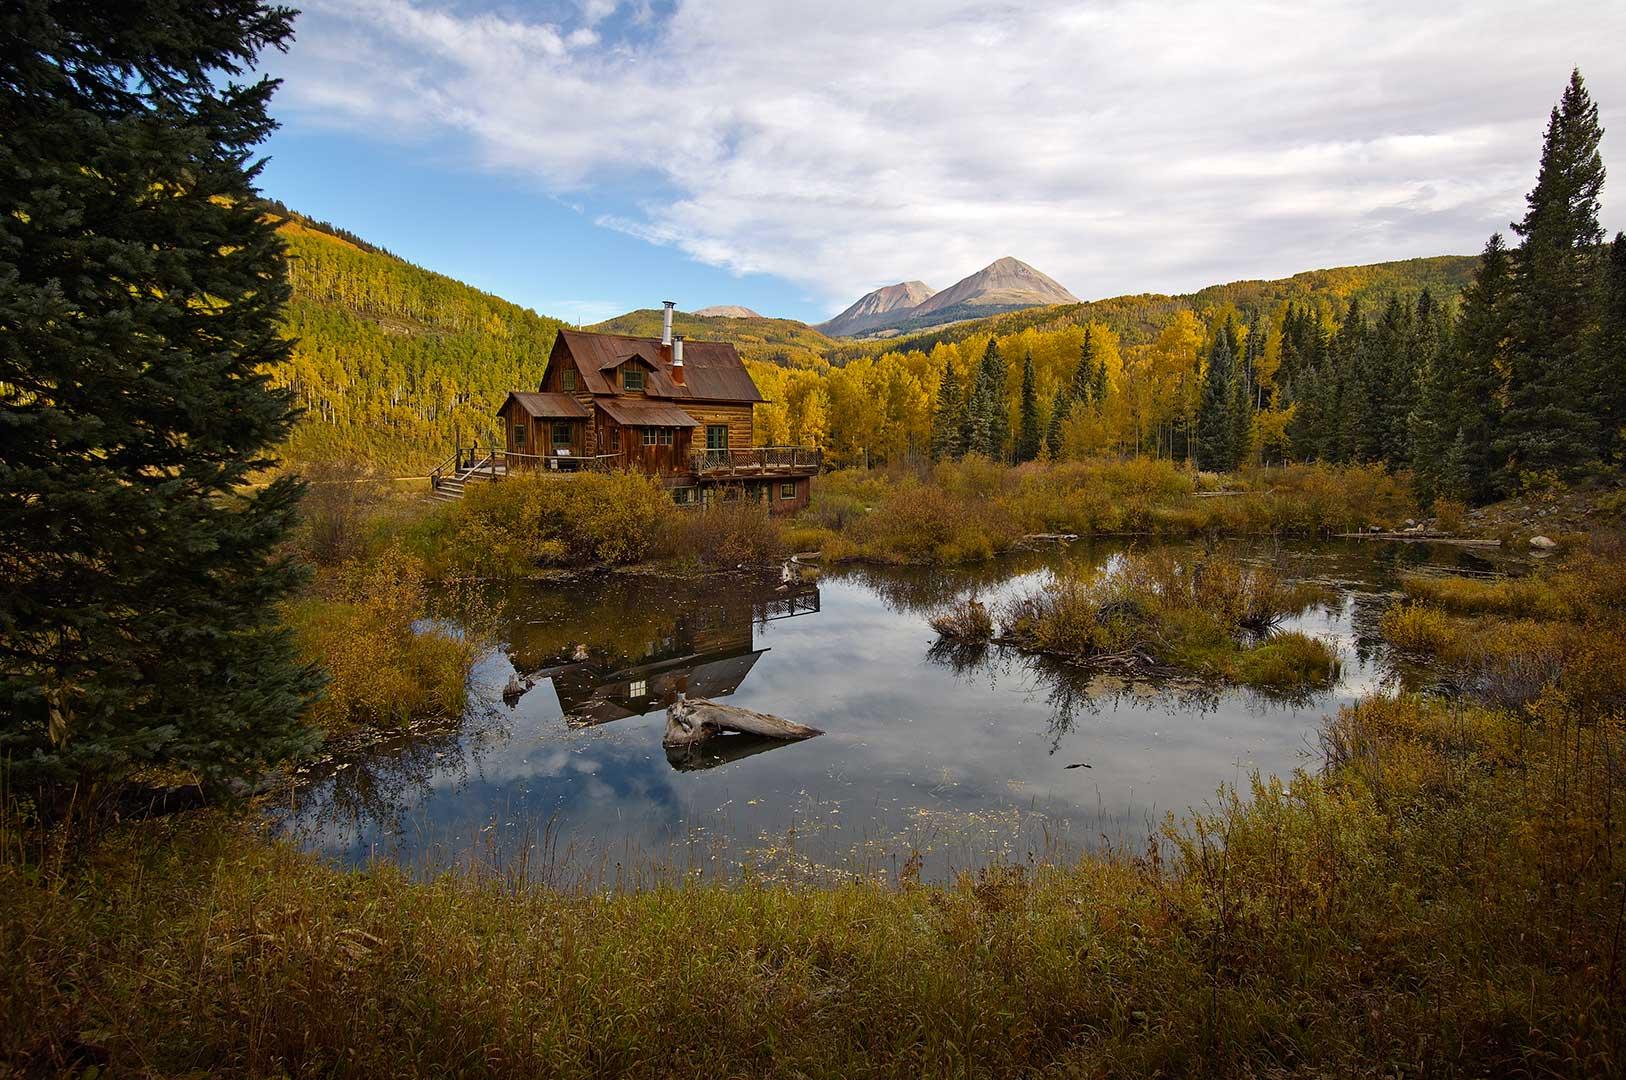 Potter House in Dunton Hot Springs Colorado